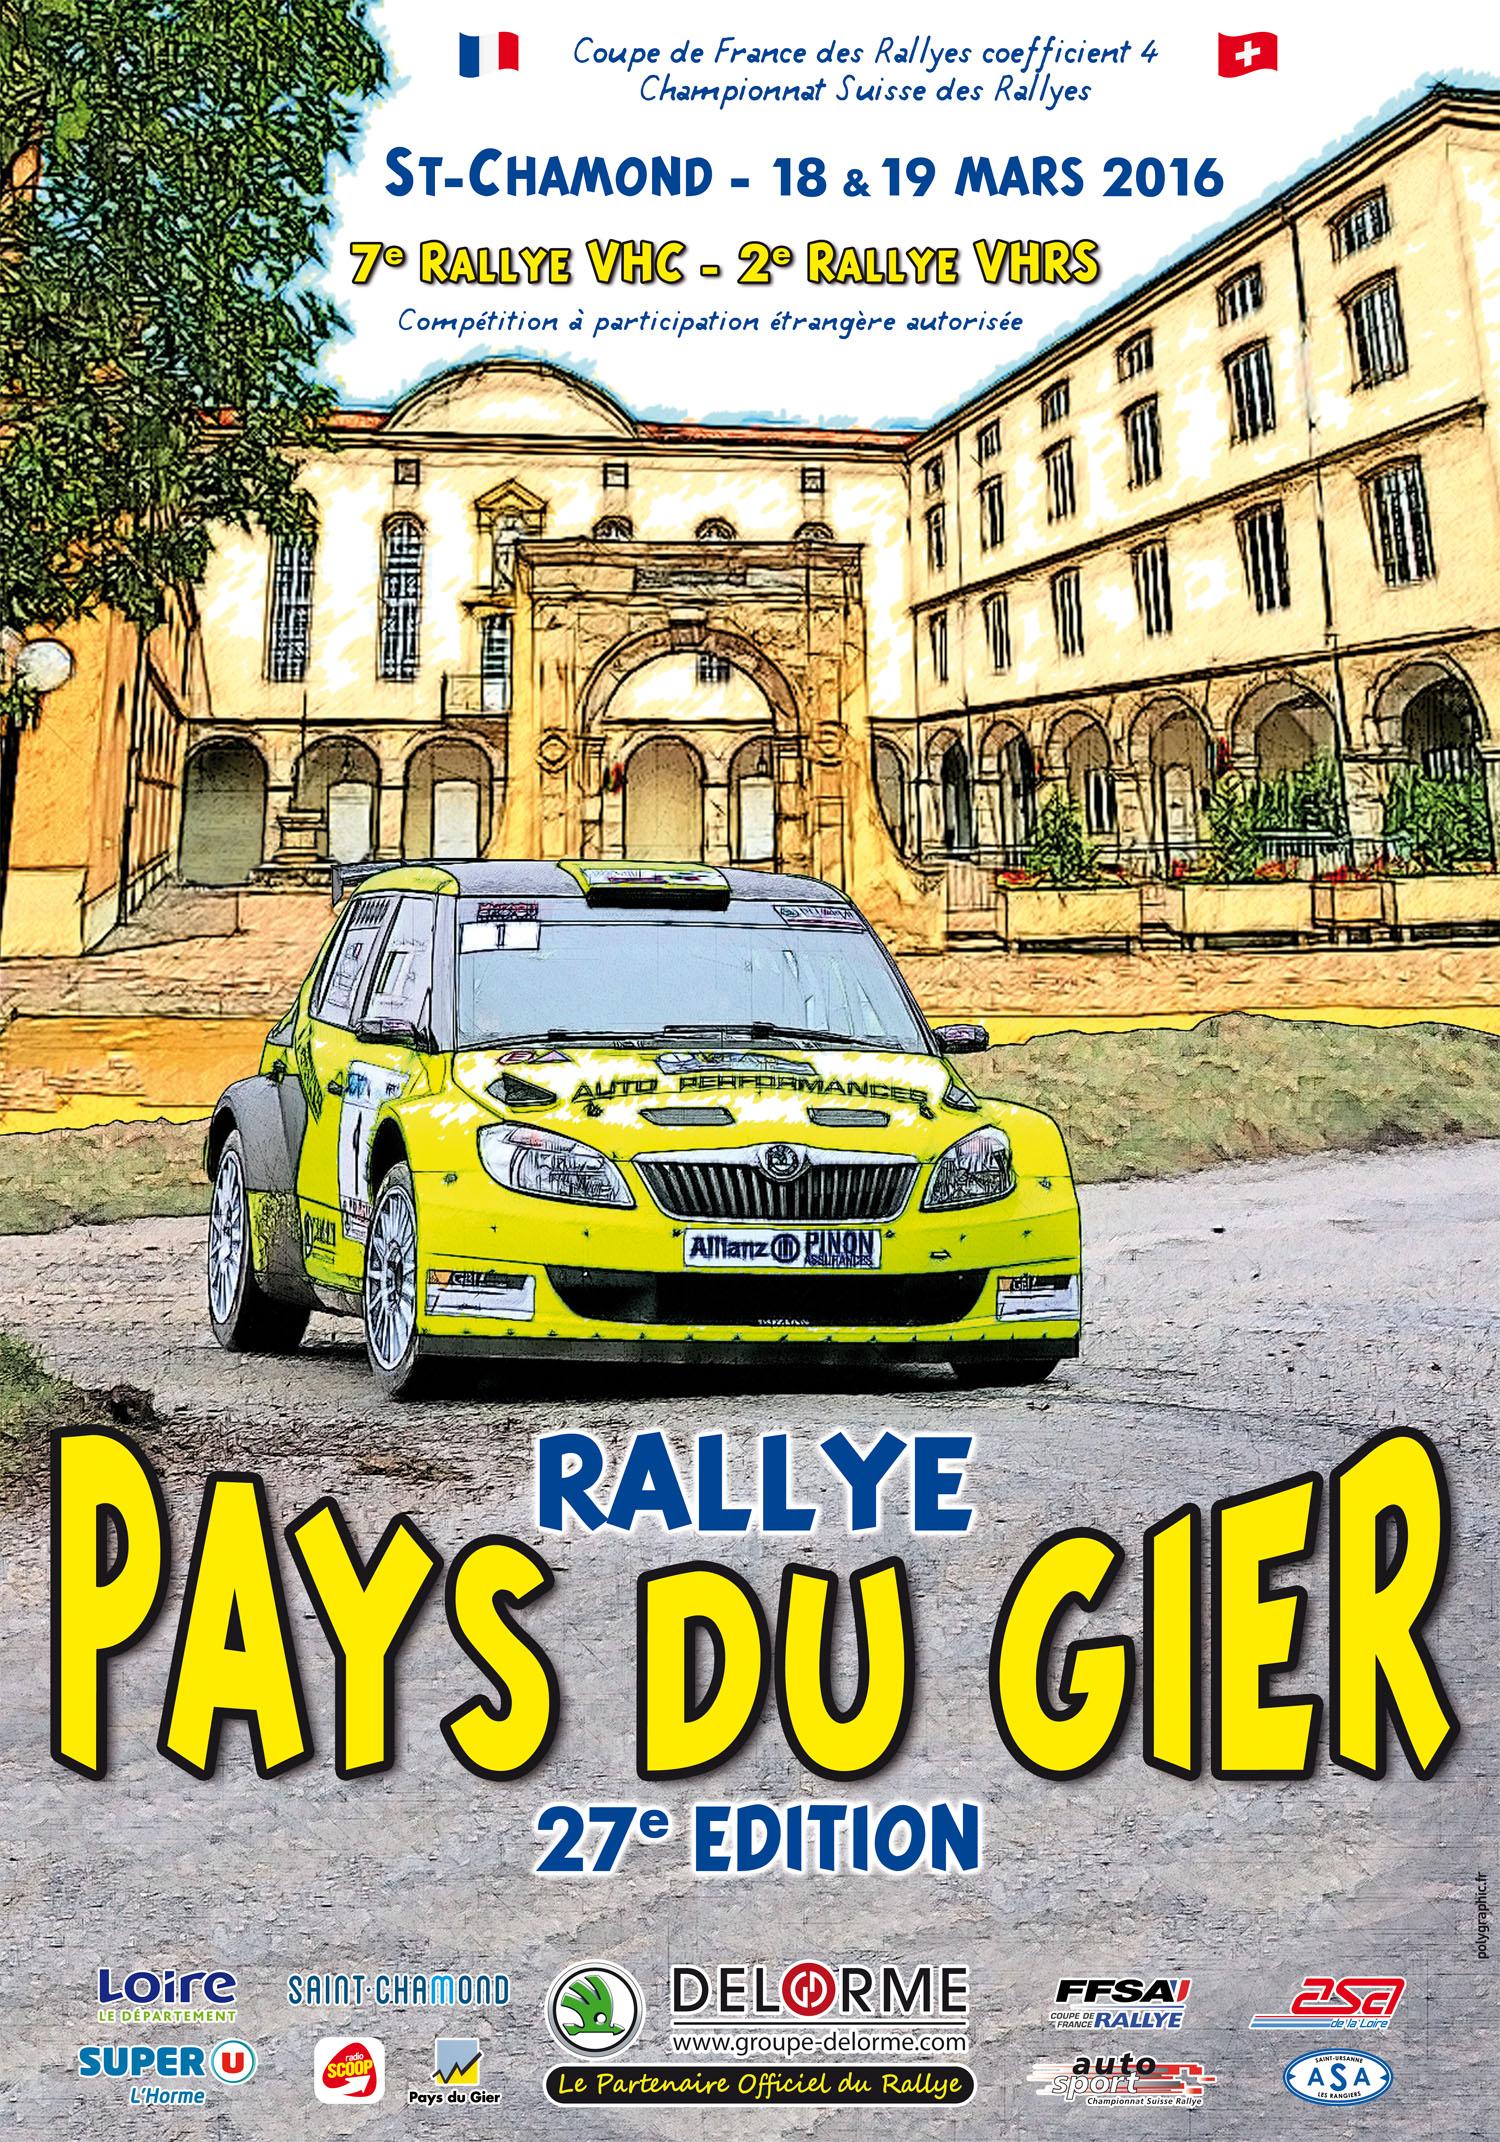 27ème Rallye Pays du Gier 2016